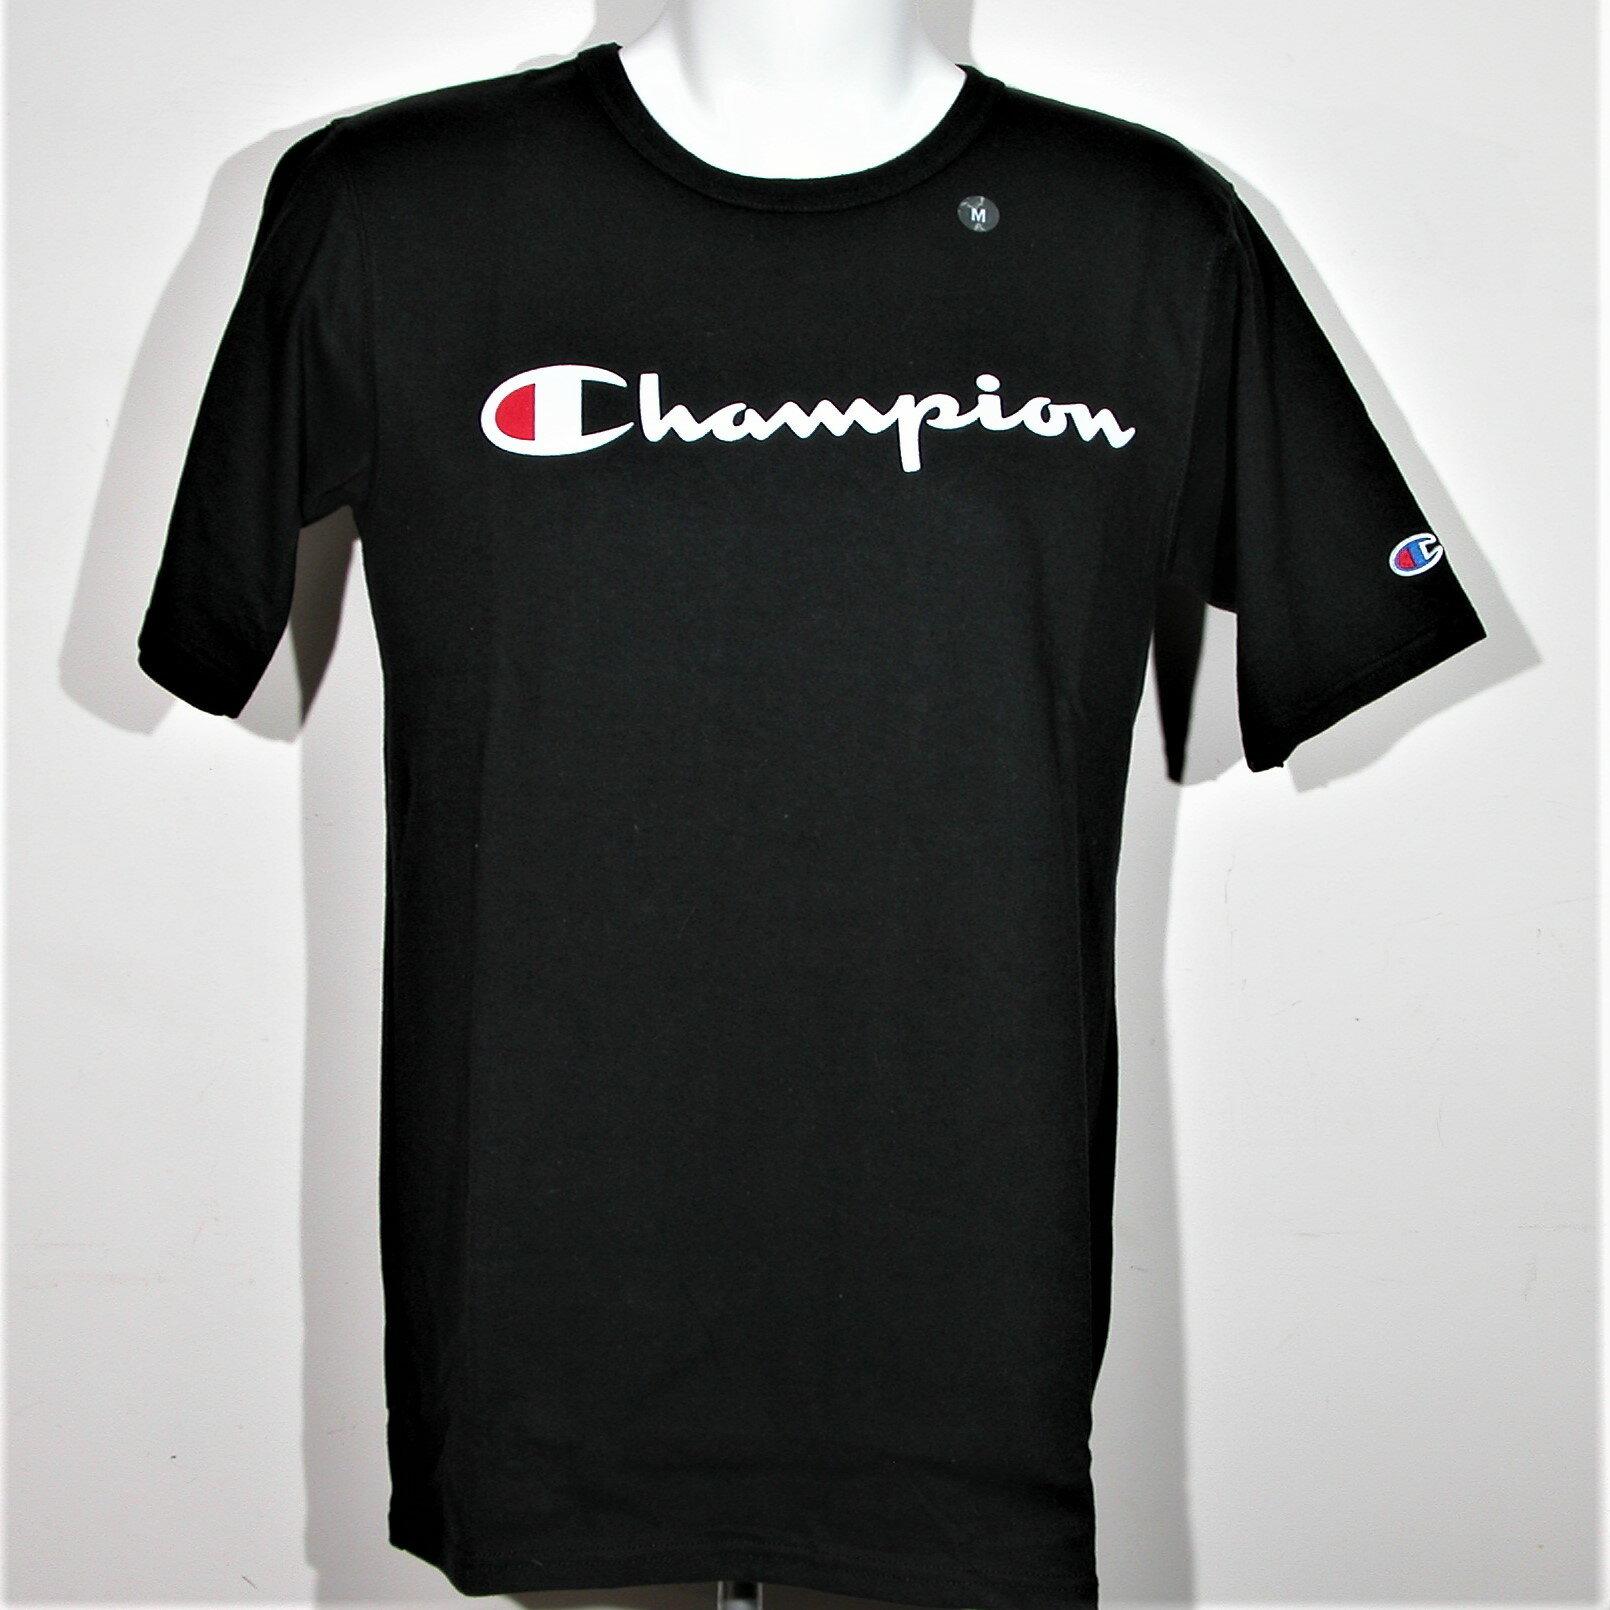 ChampionLife®男士圖文T卹,全新美國公司貨 【119 小鋪】